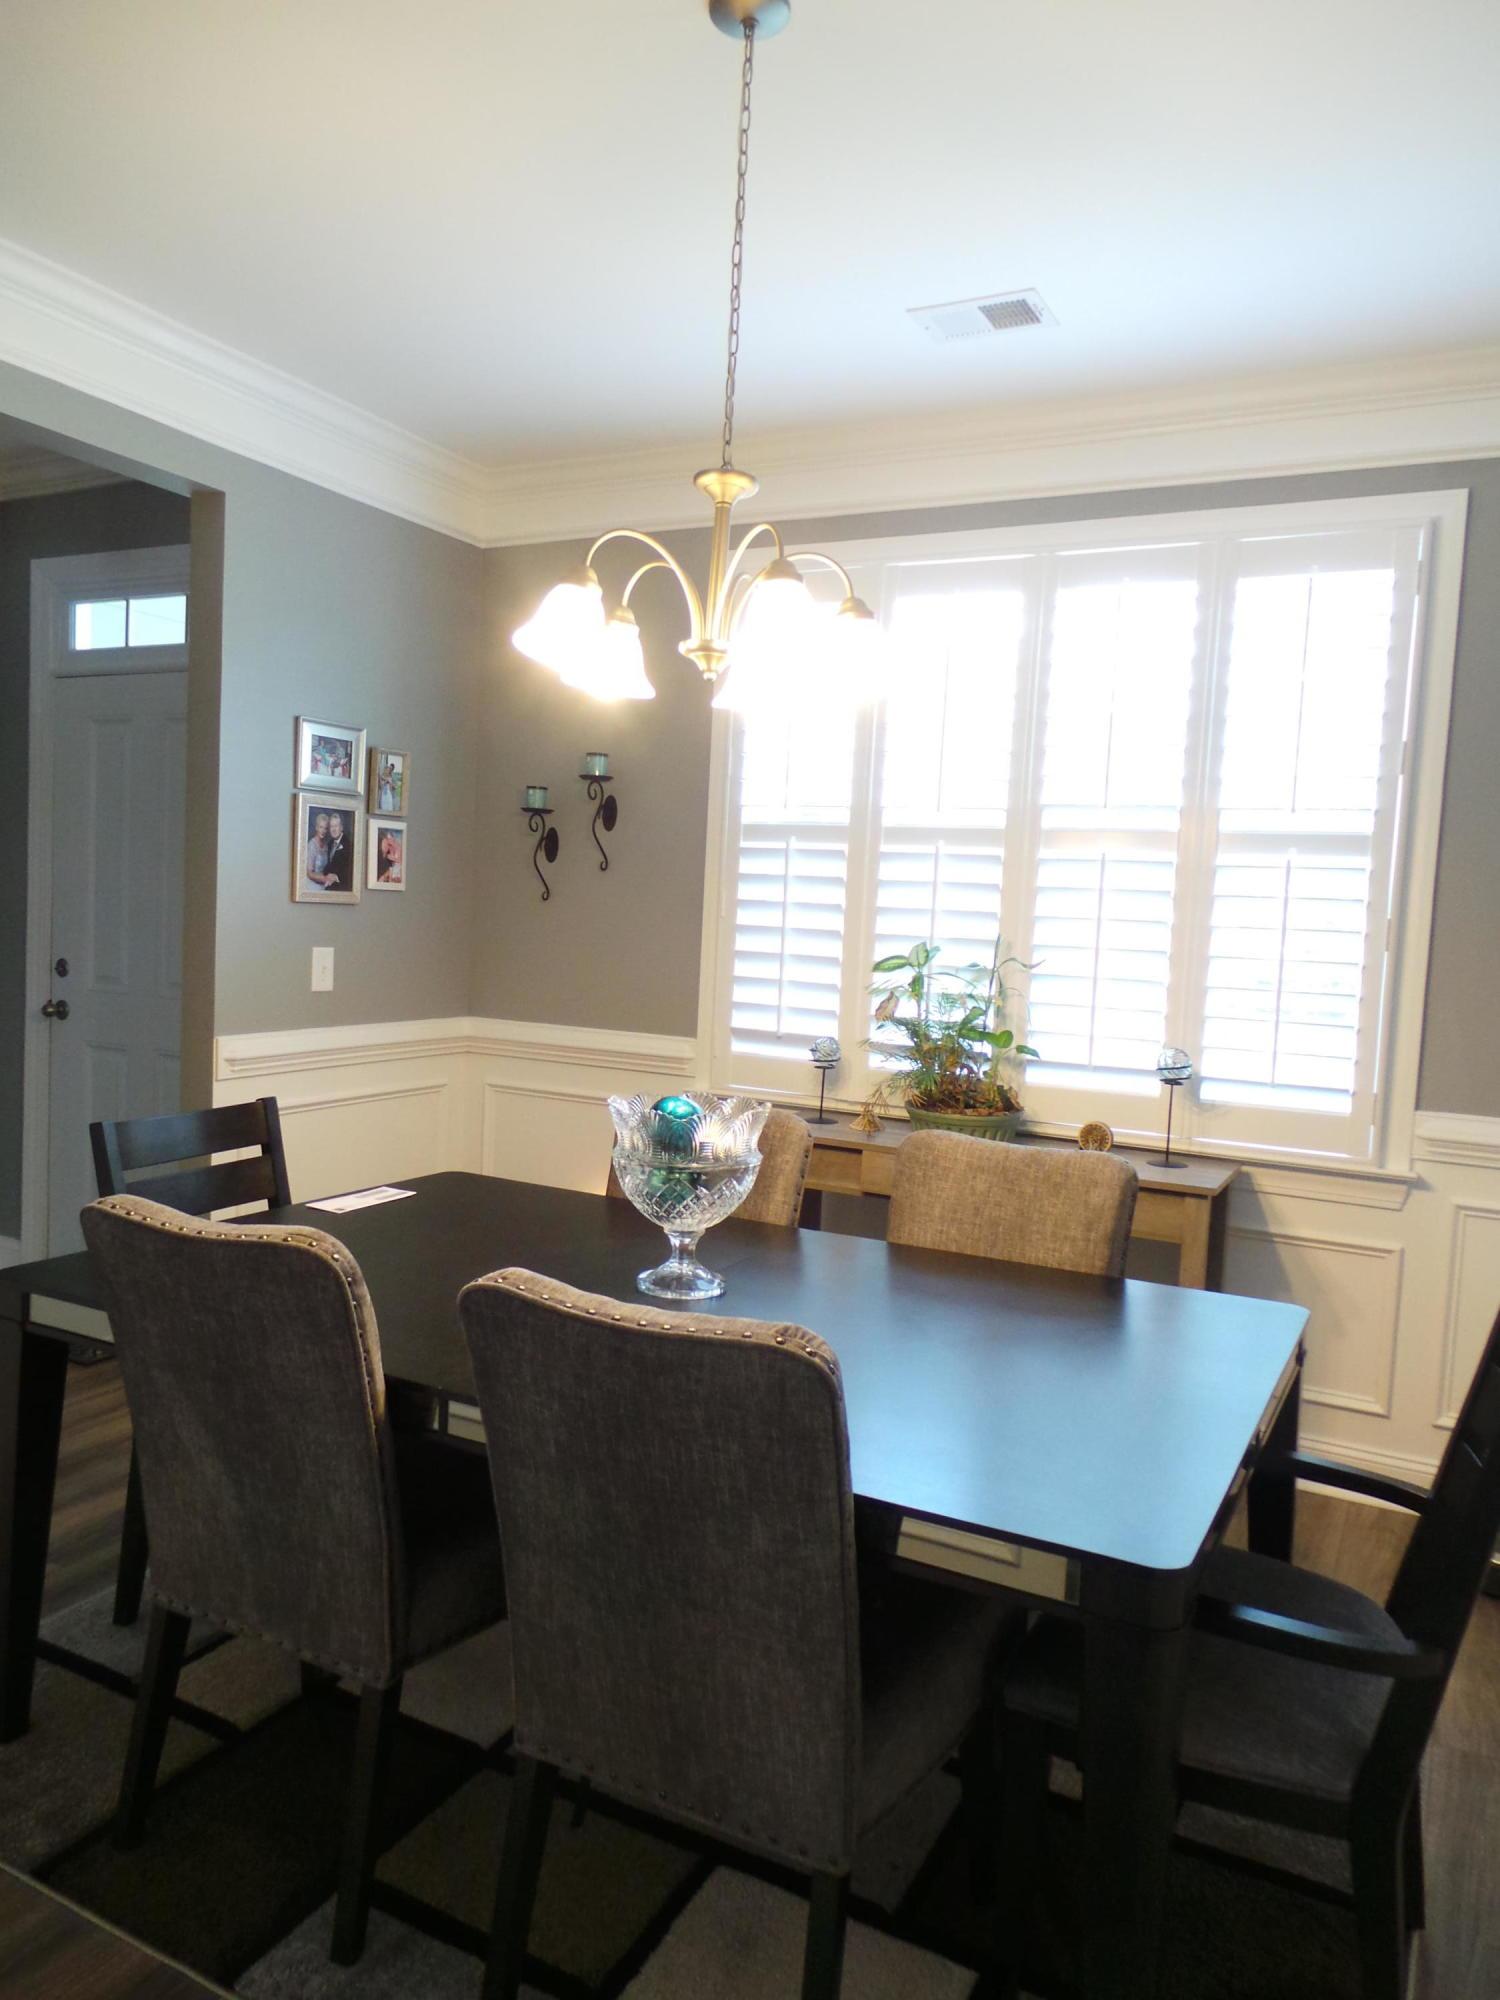 537 Pendleton Drive Moncks Corner Sc Akers Ellis Real Estate